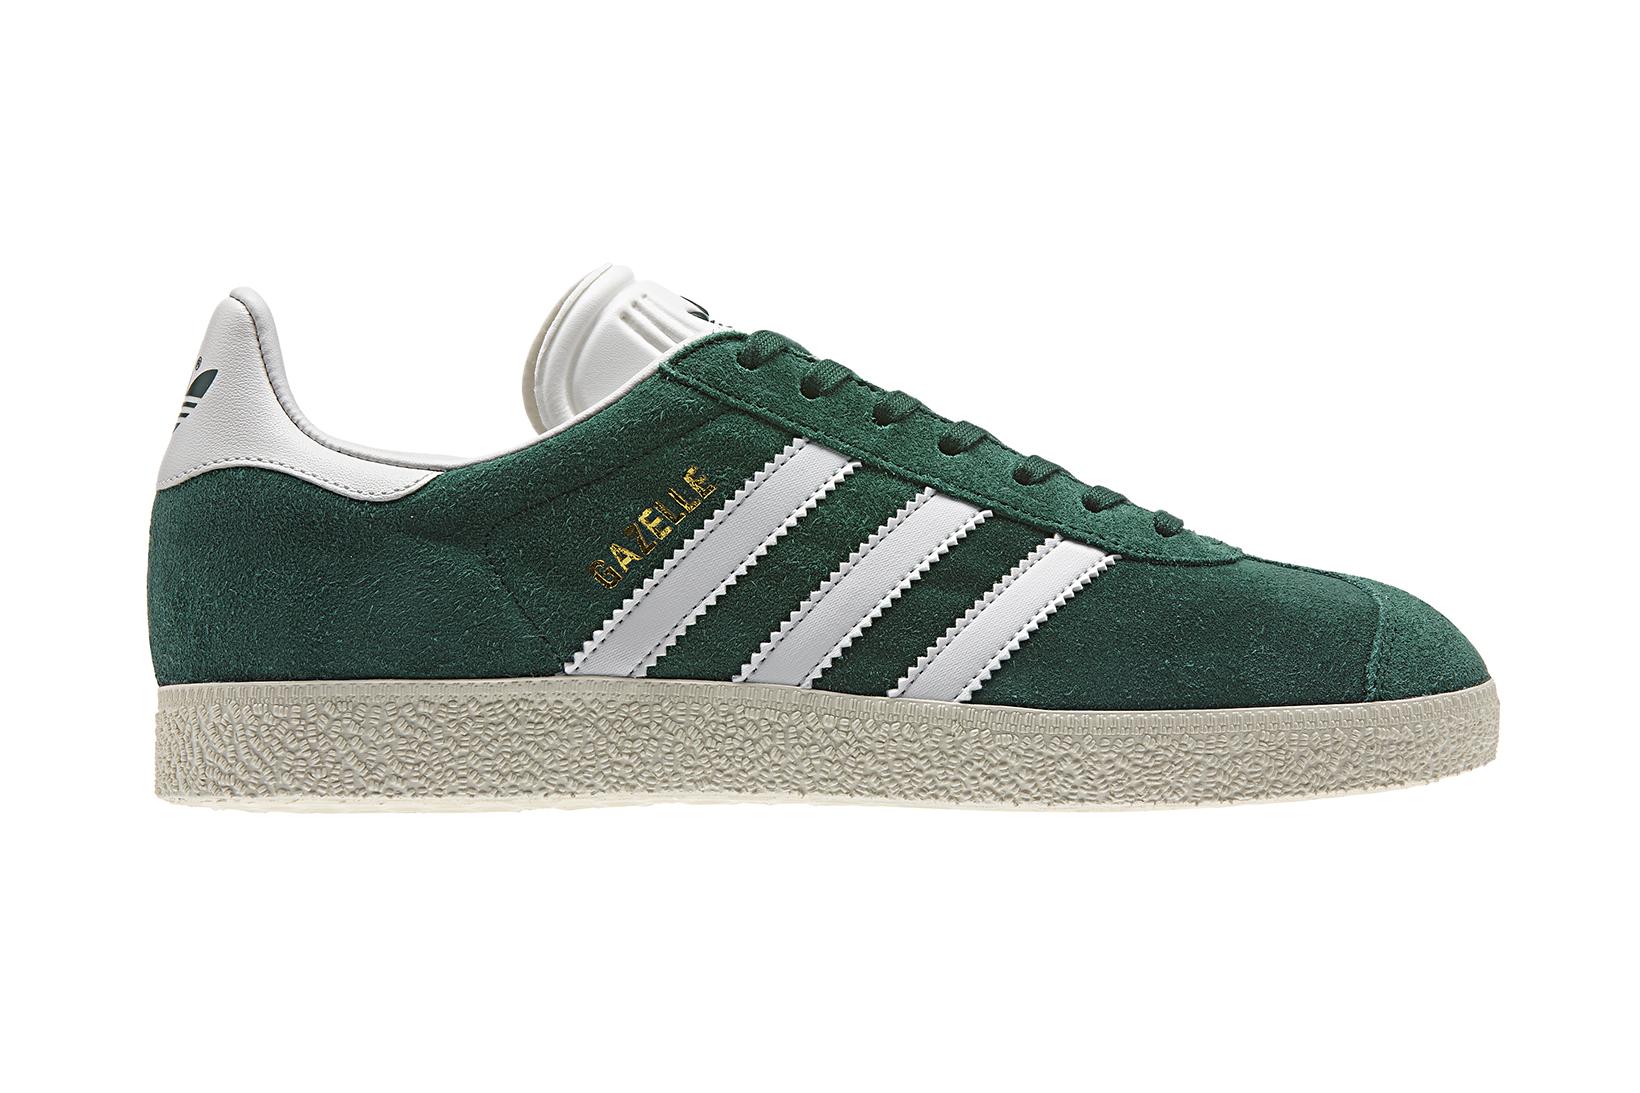 Adidas Classic Gazelle Shoes